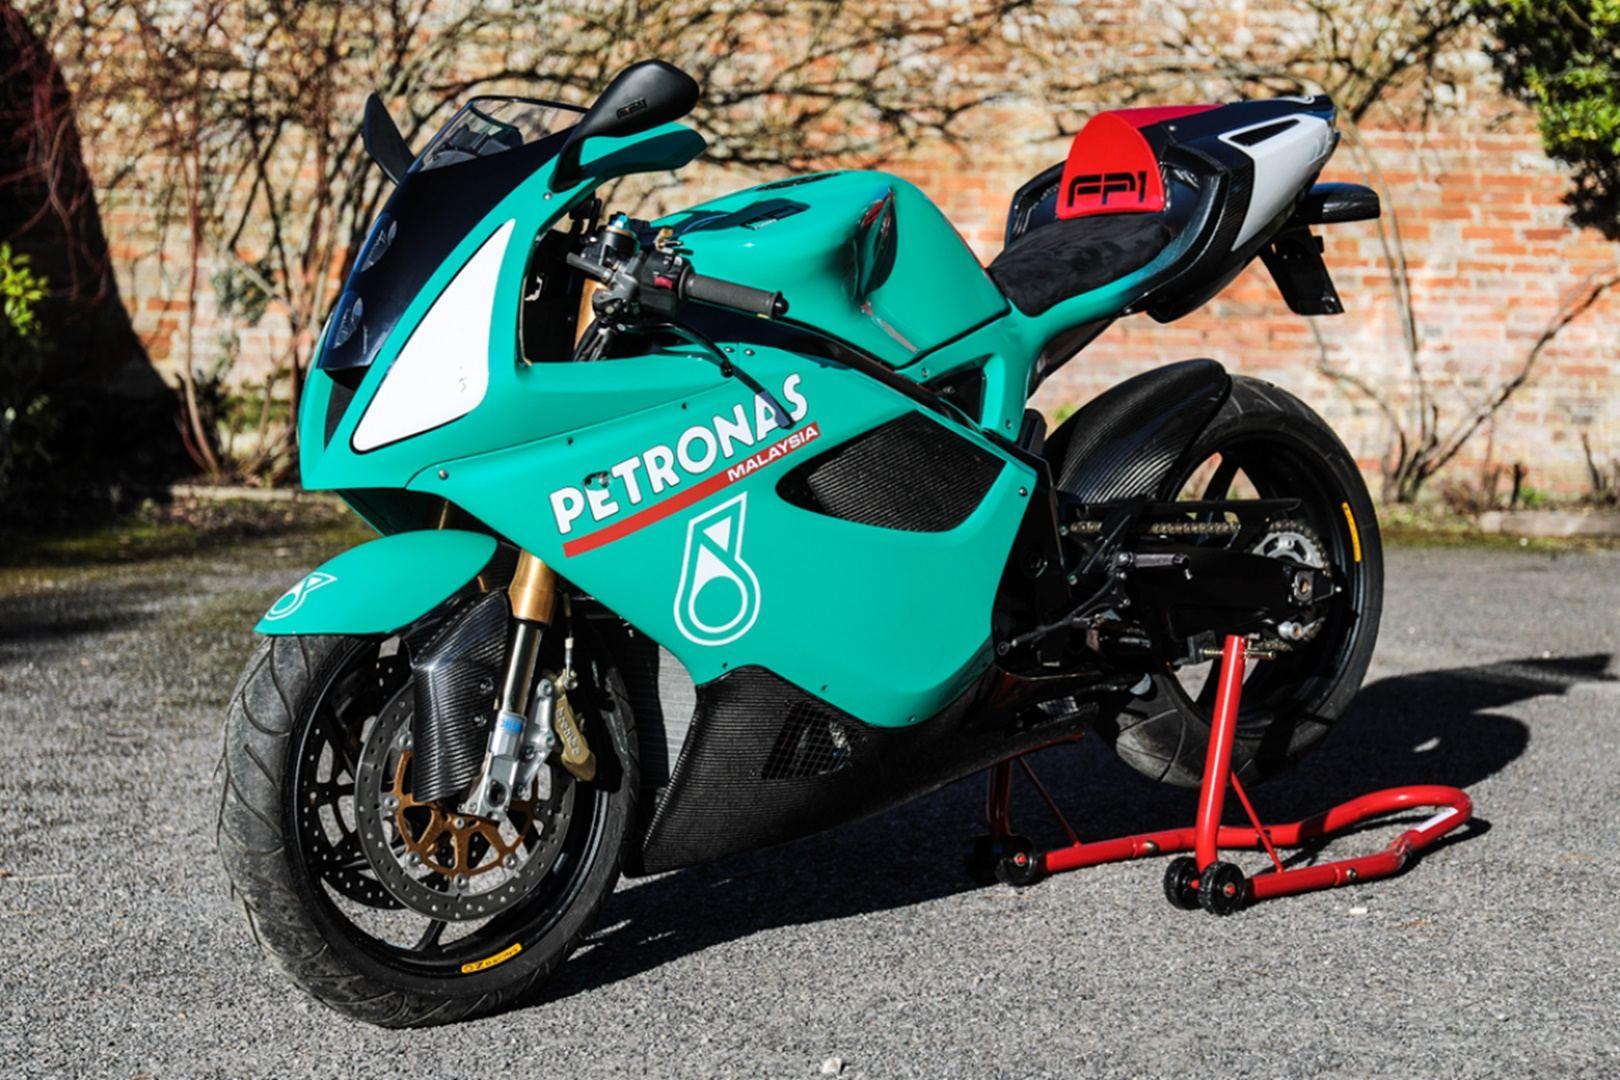 Moto del día: Triumph Daytona 1200 | espíritu RACER moto